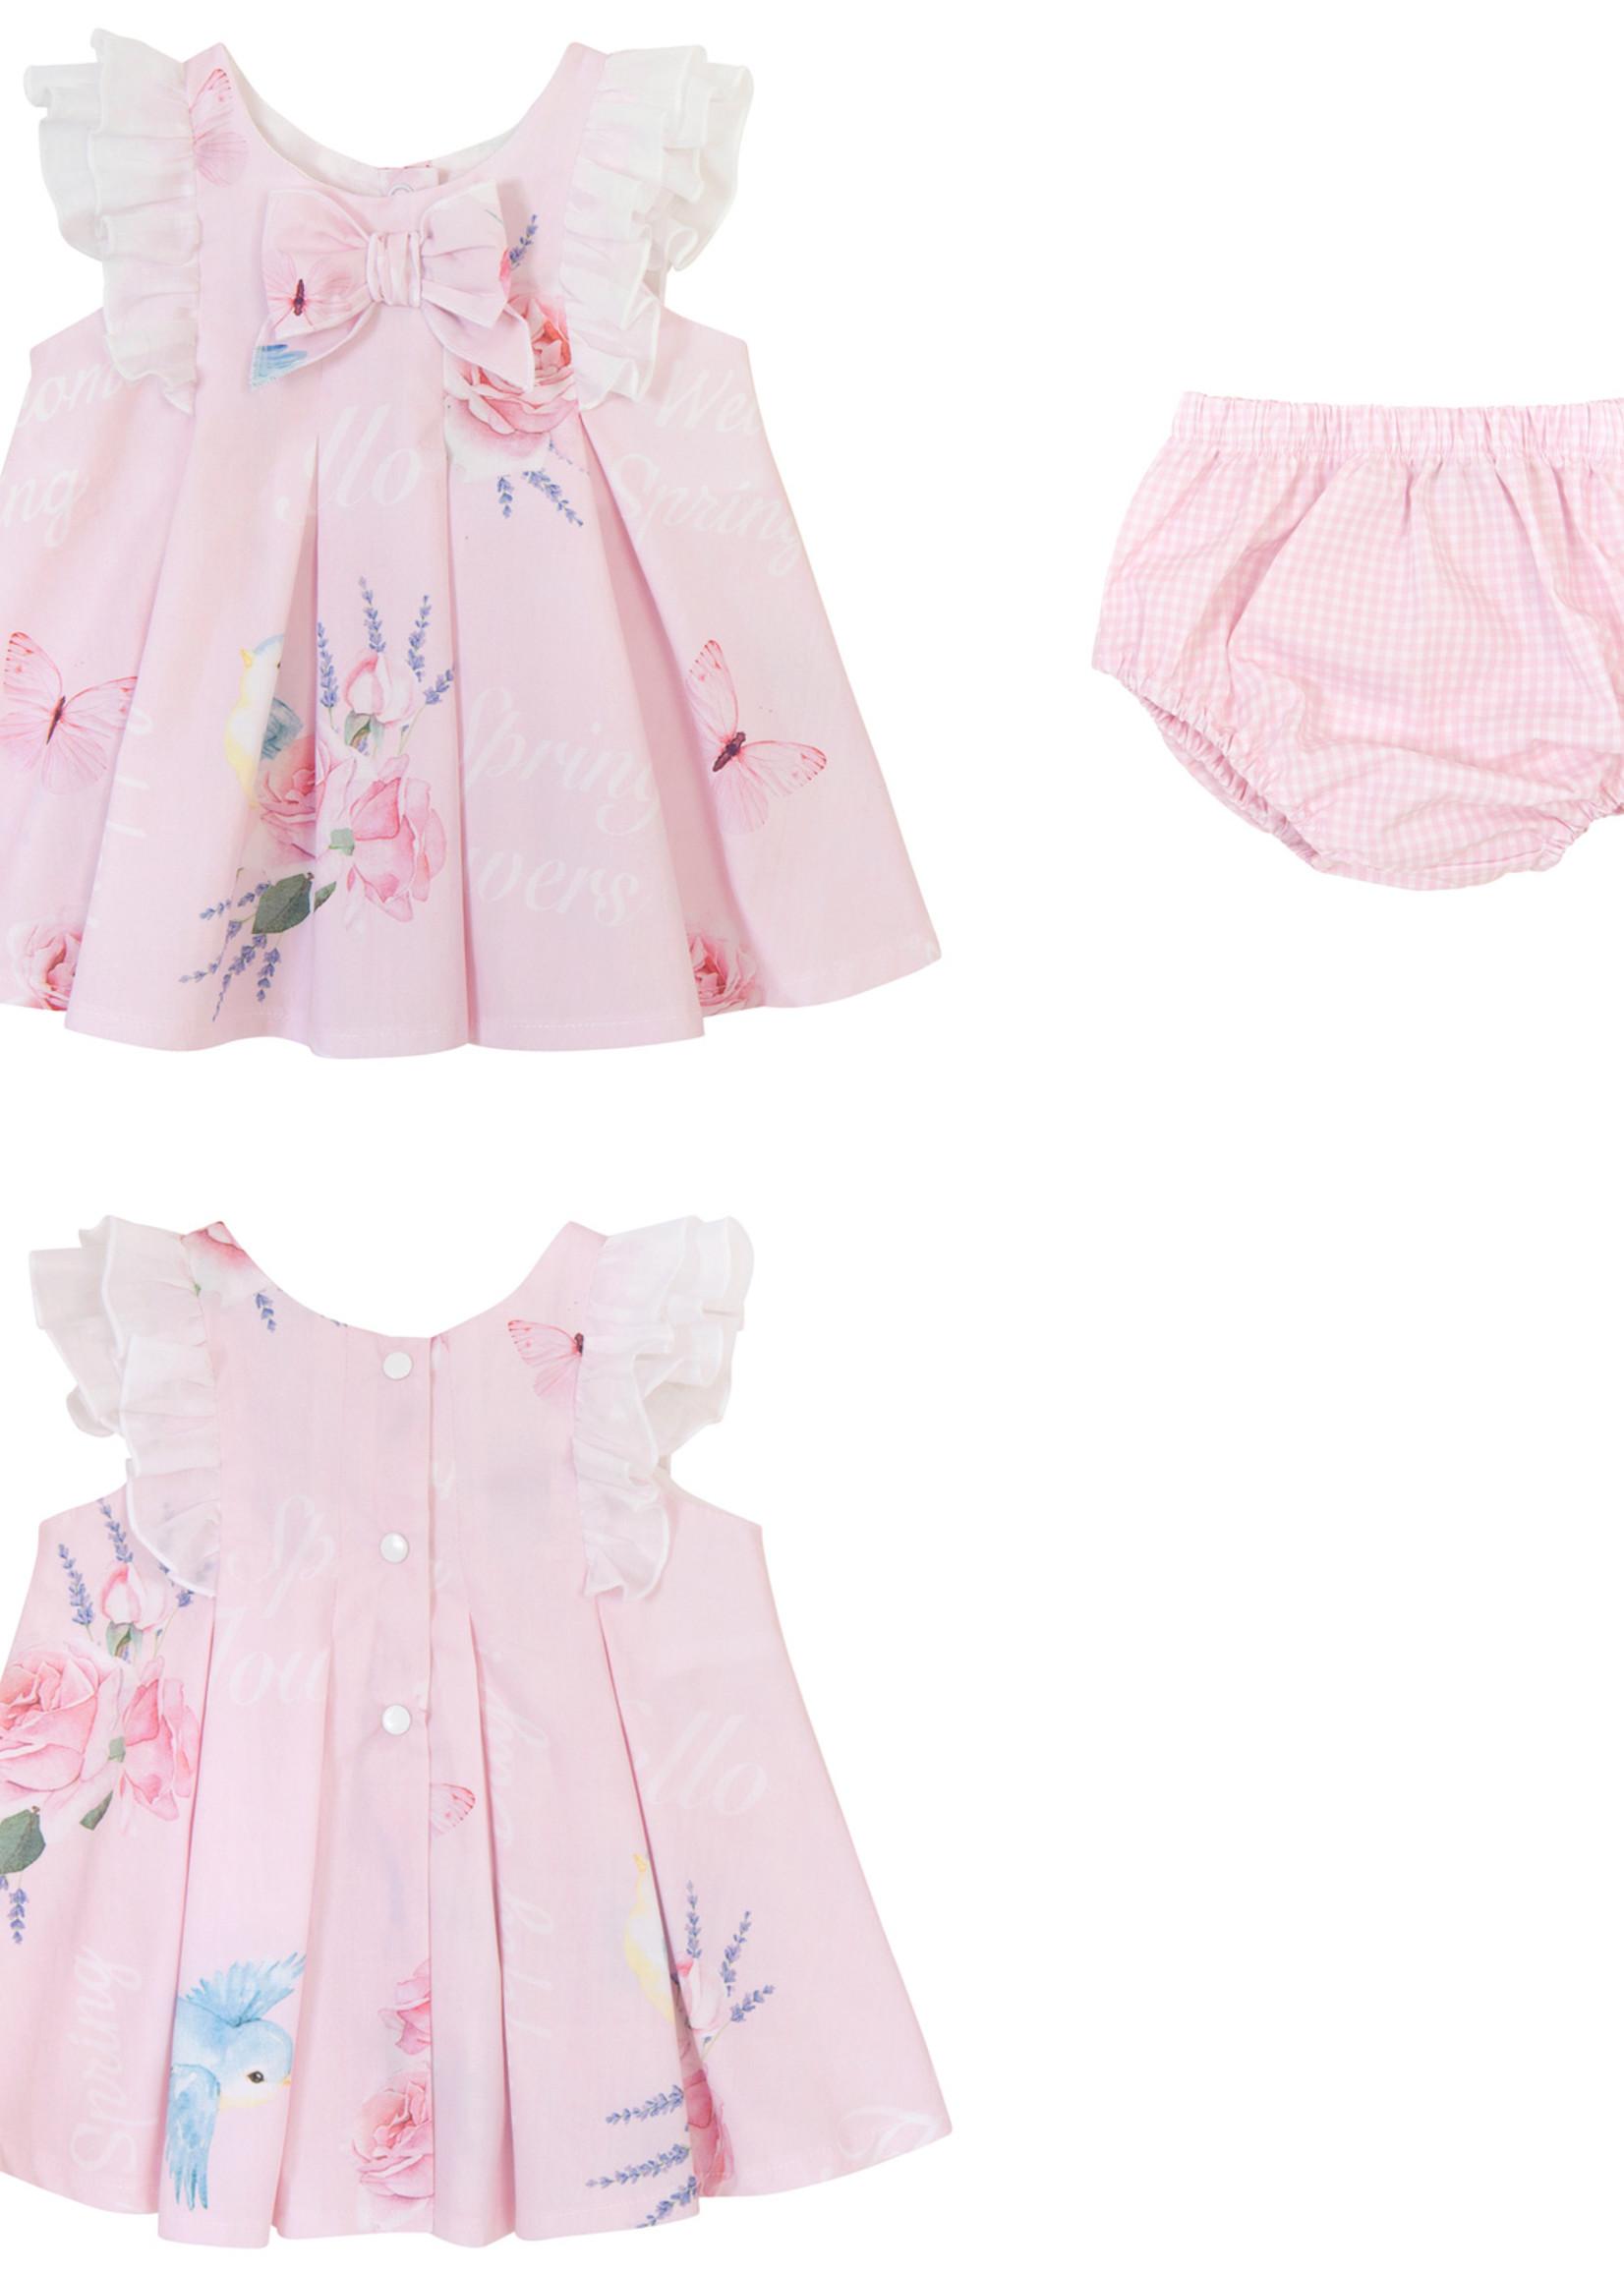 Balloon Chic Balloon Chic spring babyset pink  907